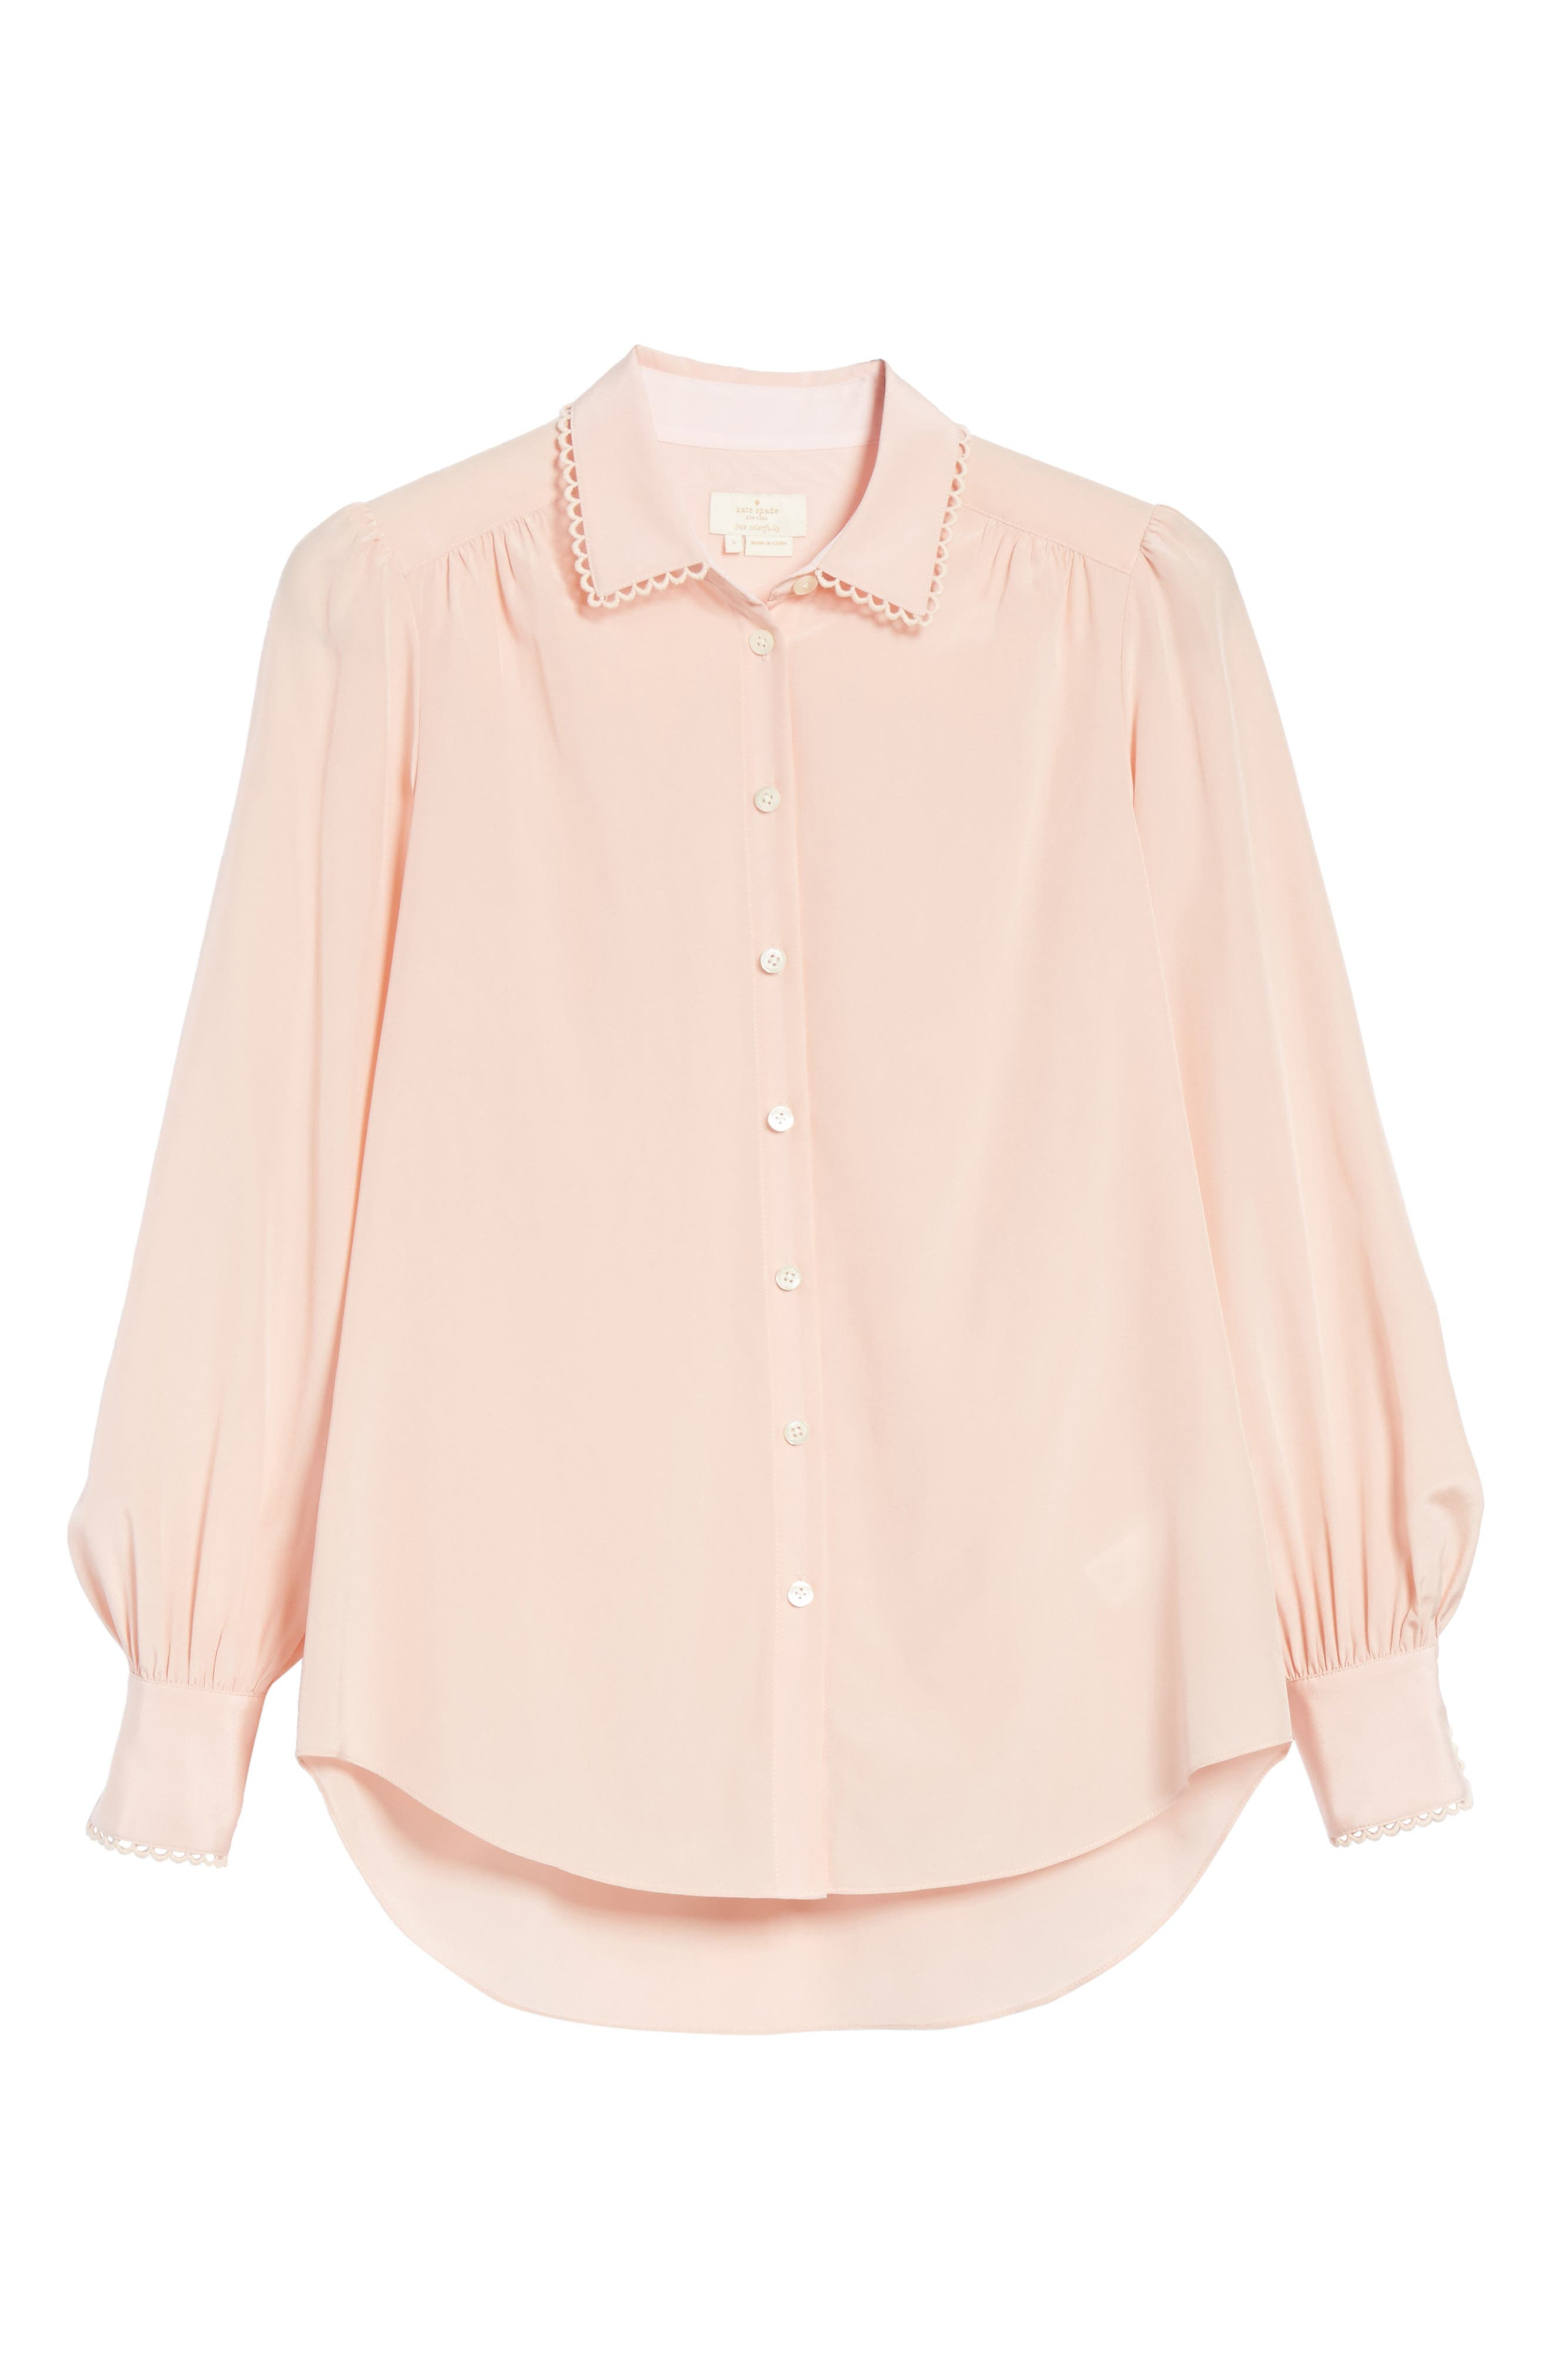 KATE SPADE NEW YORK,                             scallop trim silk shirt,                             Alternate thumbnail 6, color,                             663